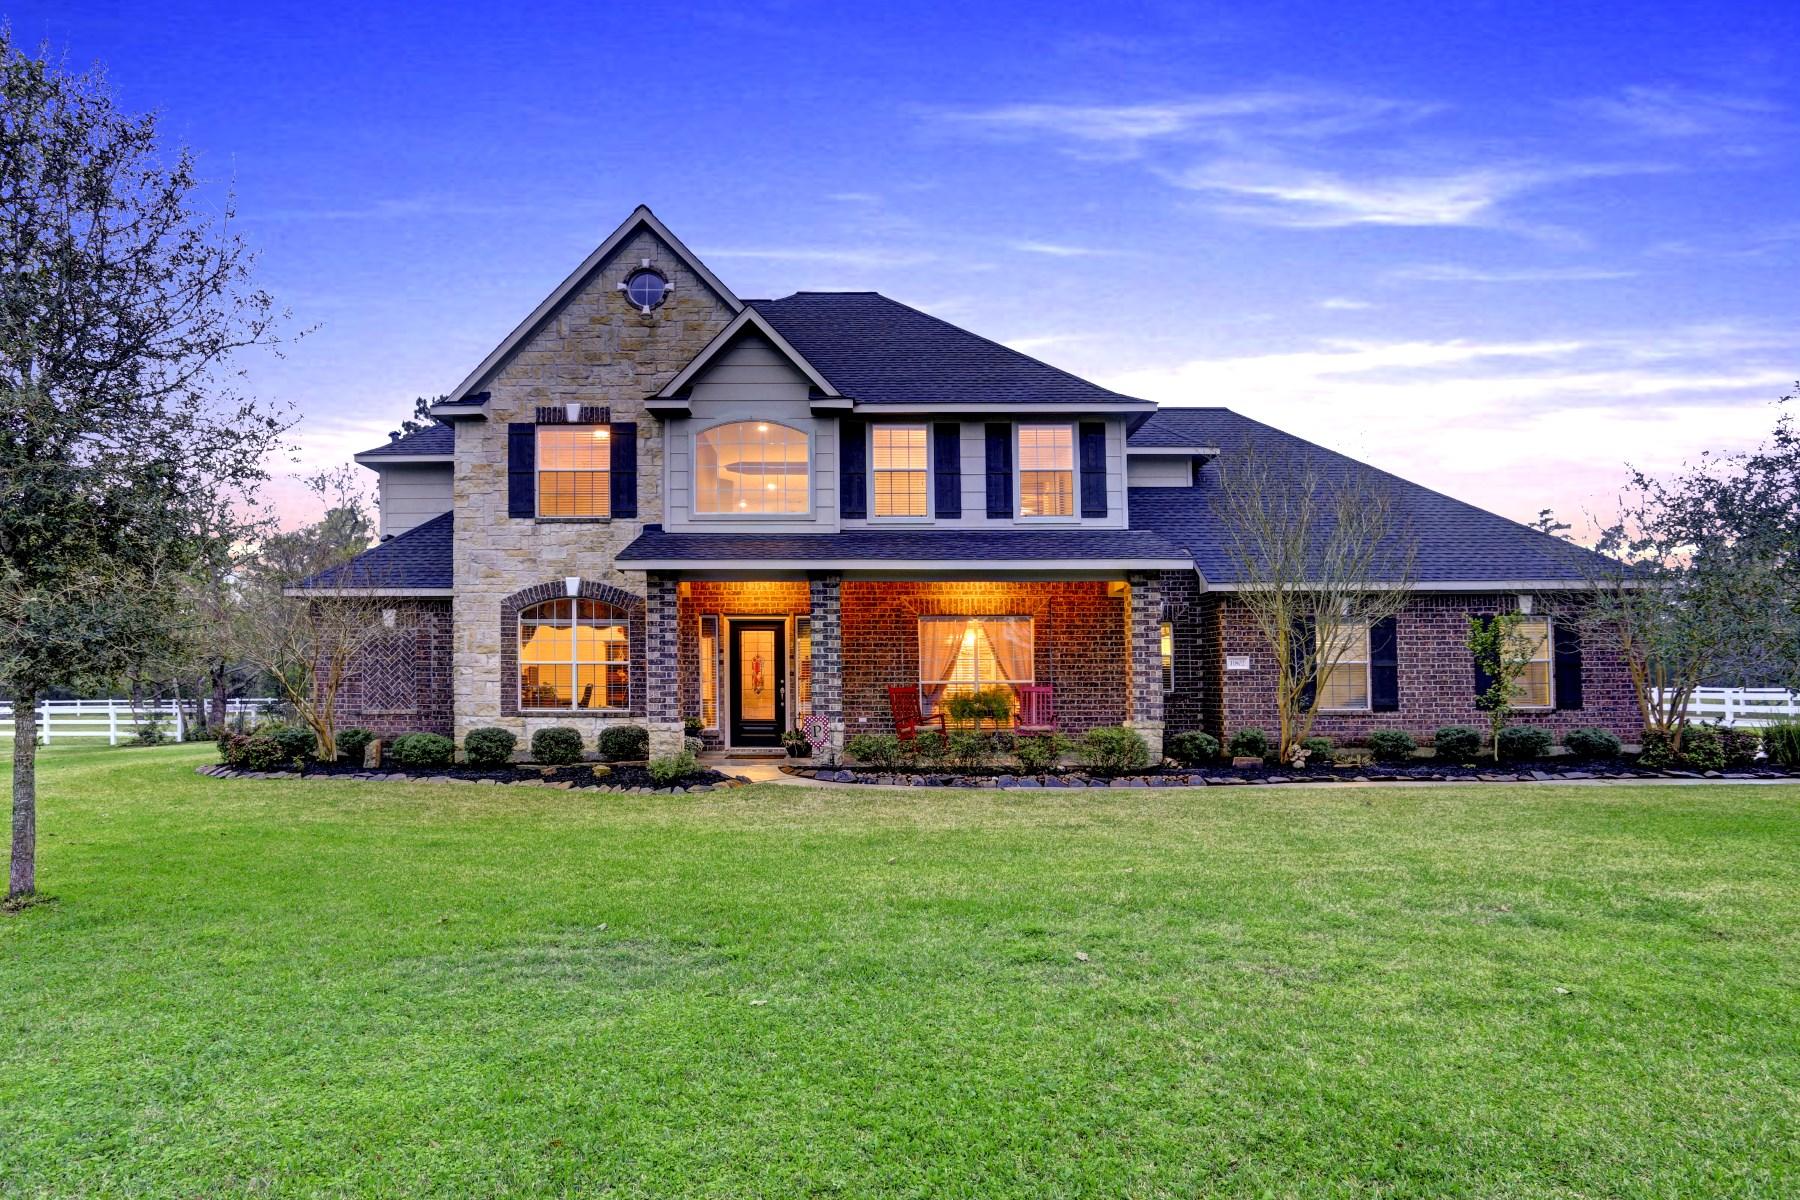 Single Family Home for Sale at 11802 Rainy Oaks Drive Magnolia, Texas 77354 United States